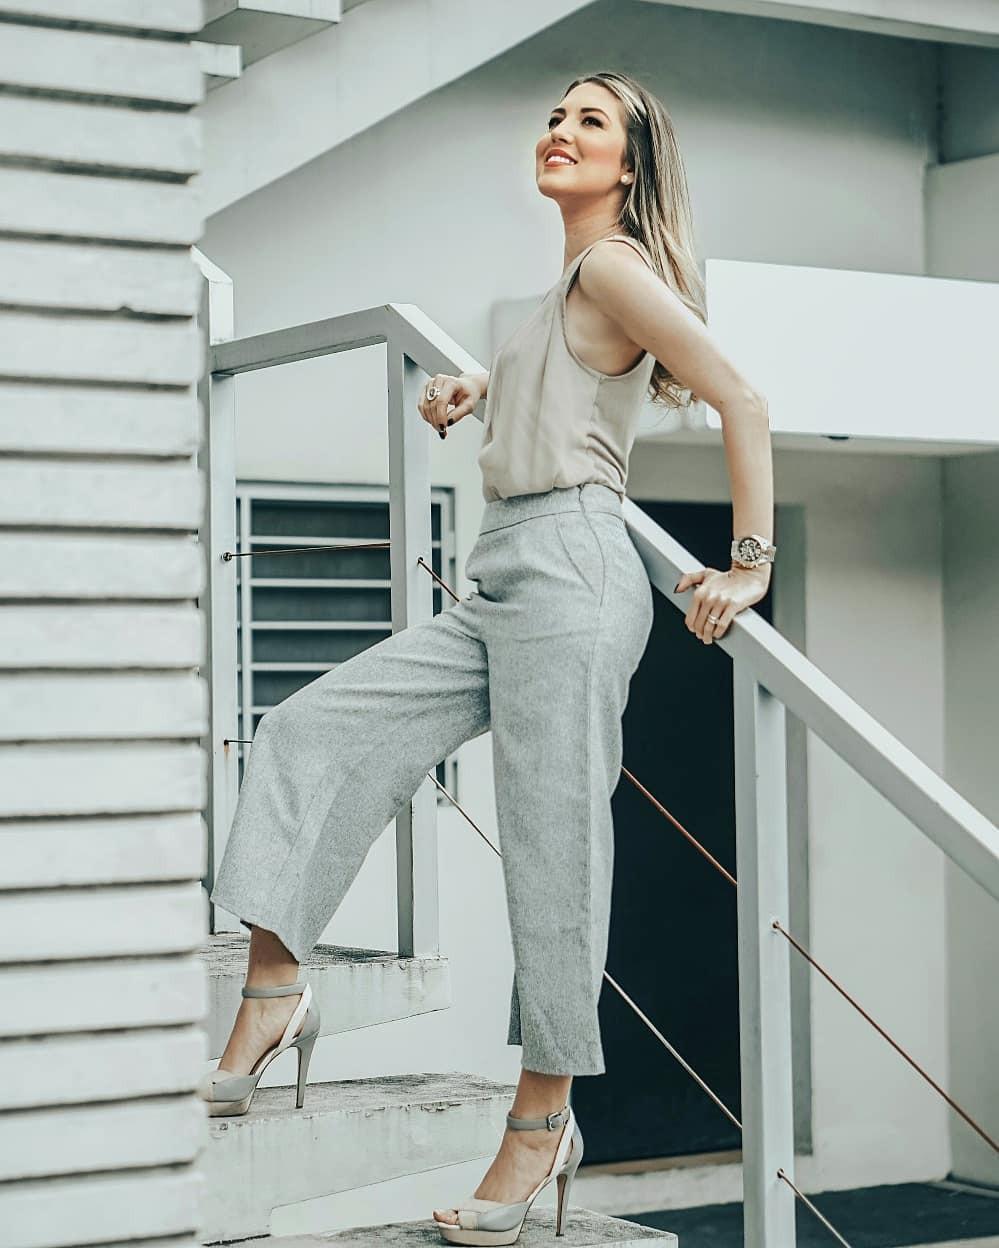 Alejandra Inestroza hot girls photoshoot, legs picture, wardrobe ideas